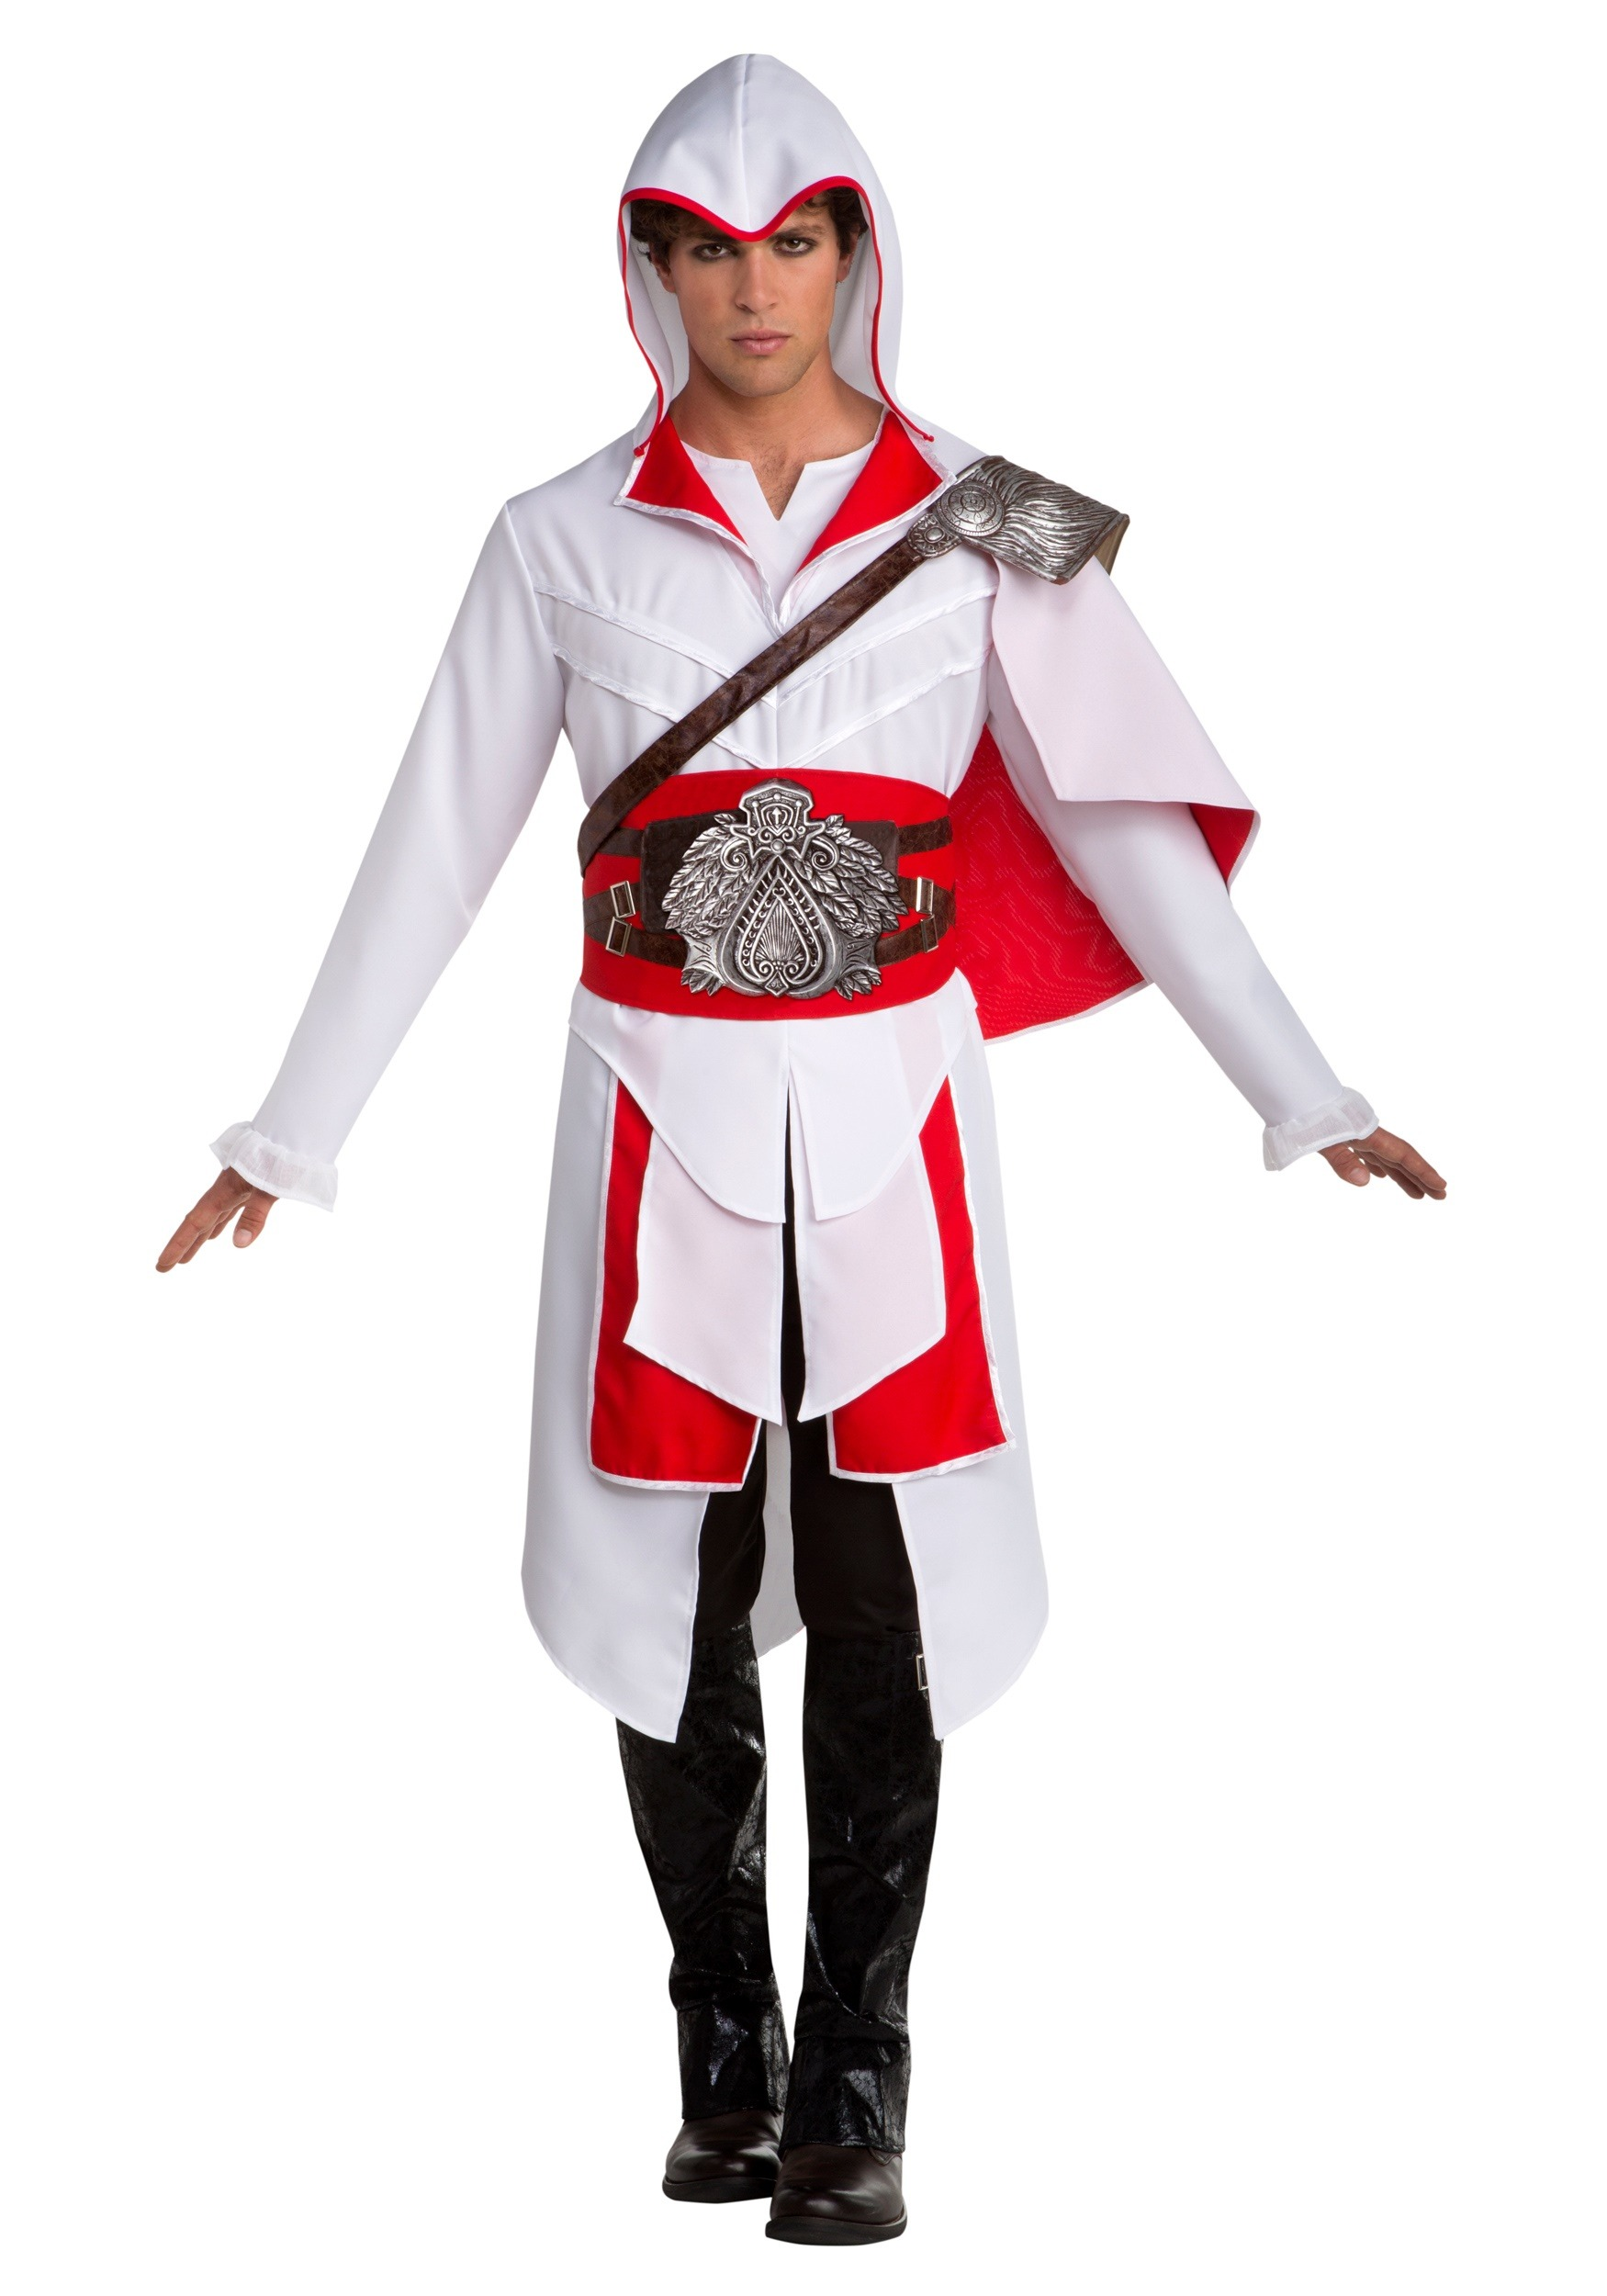 Assassin's Creed II Ezio Fancy Dress Costume for Men